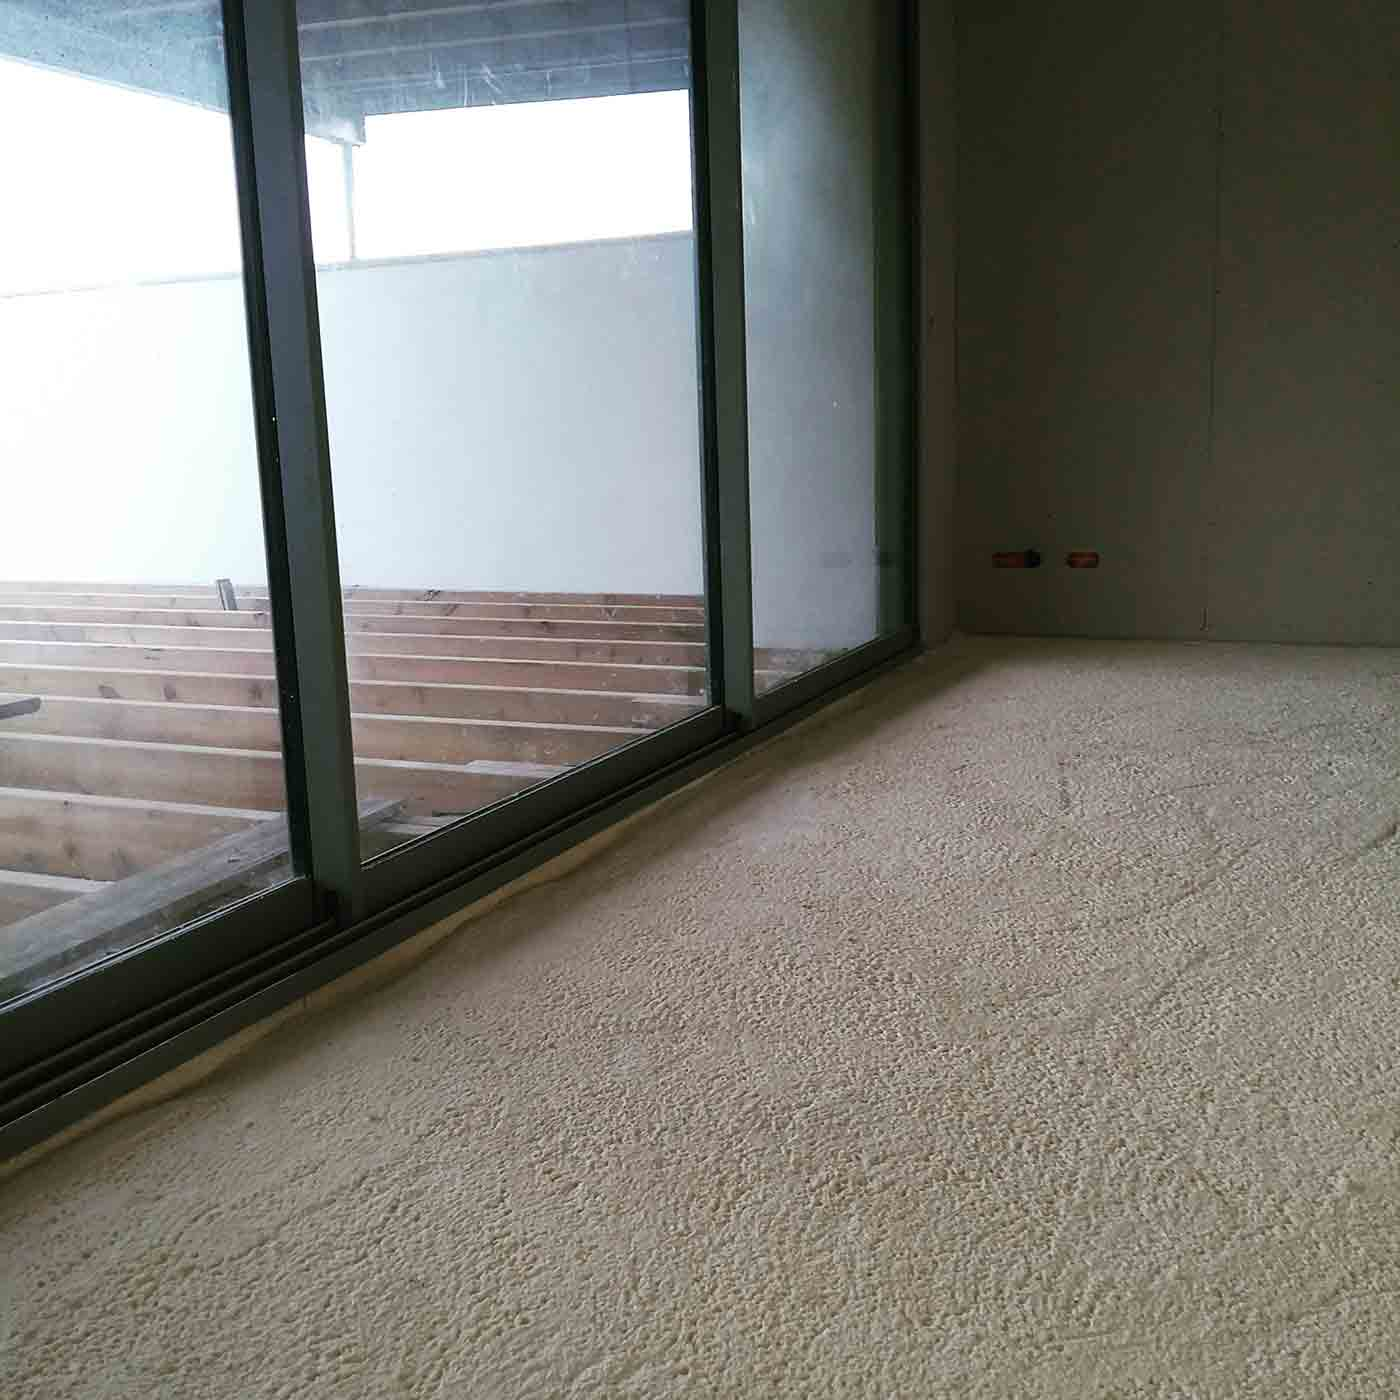 aislamiento suelo y paredes poliuretano mousse polyurethane